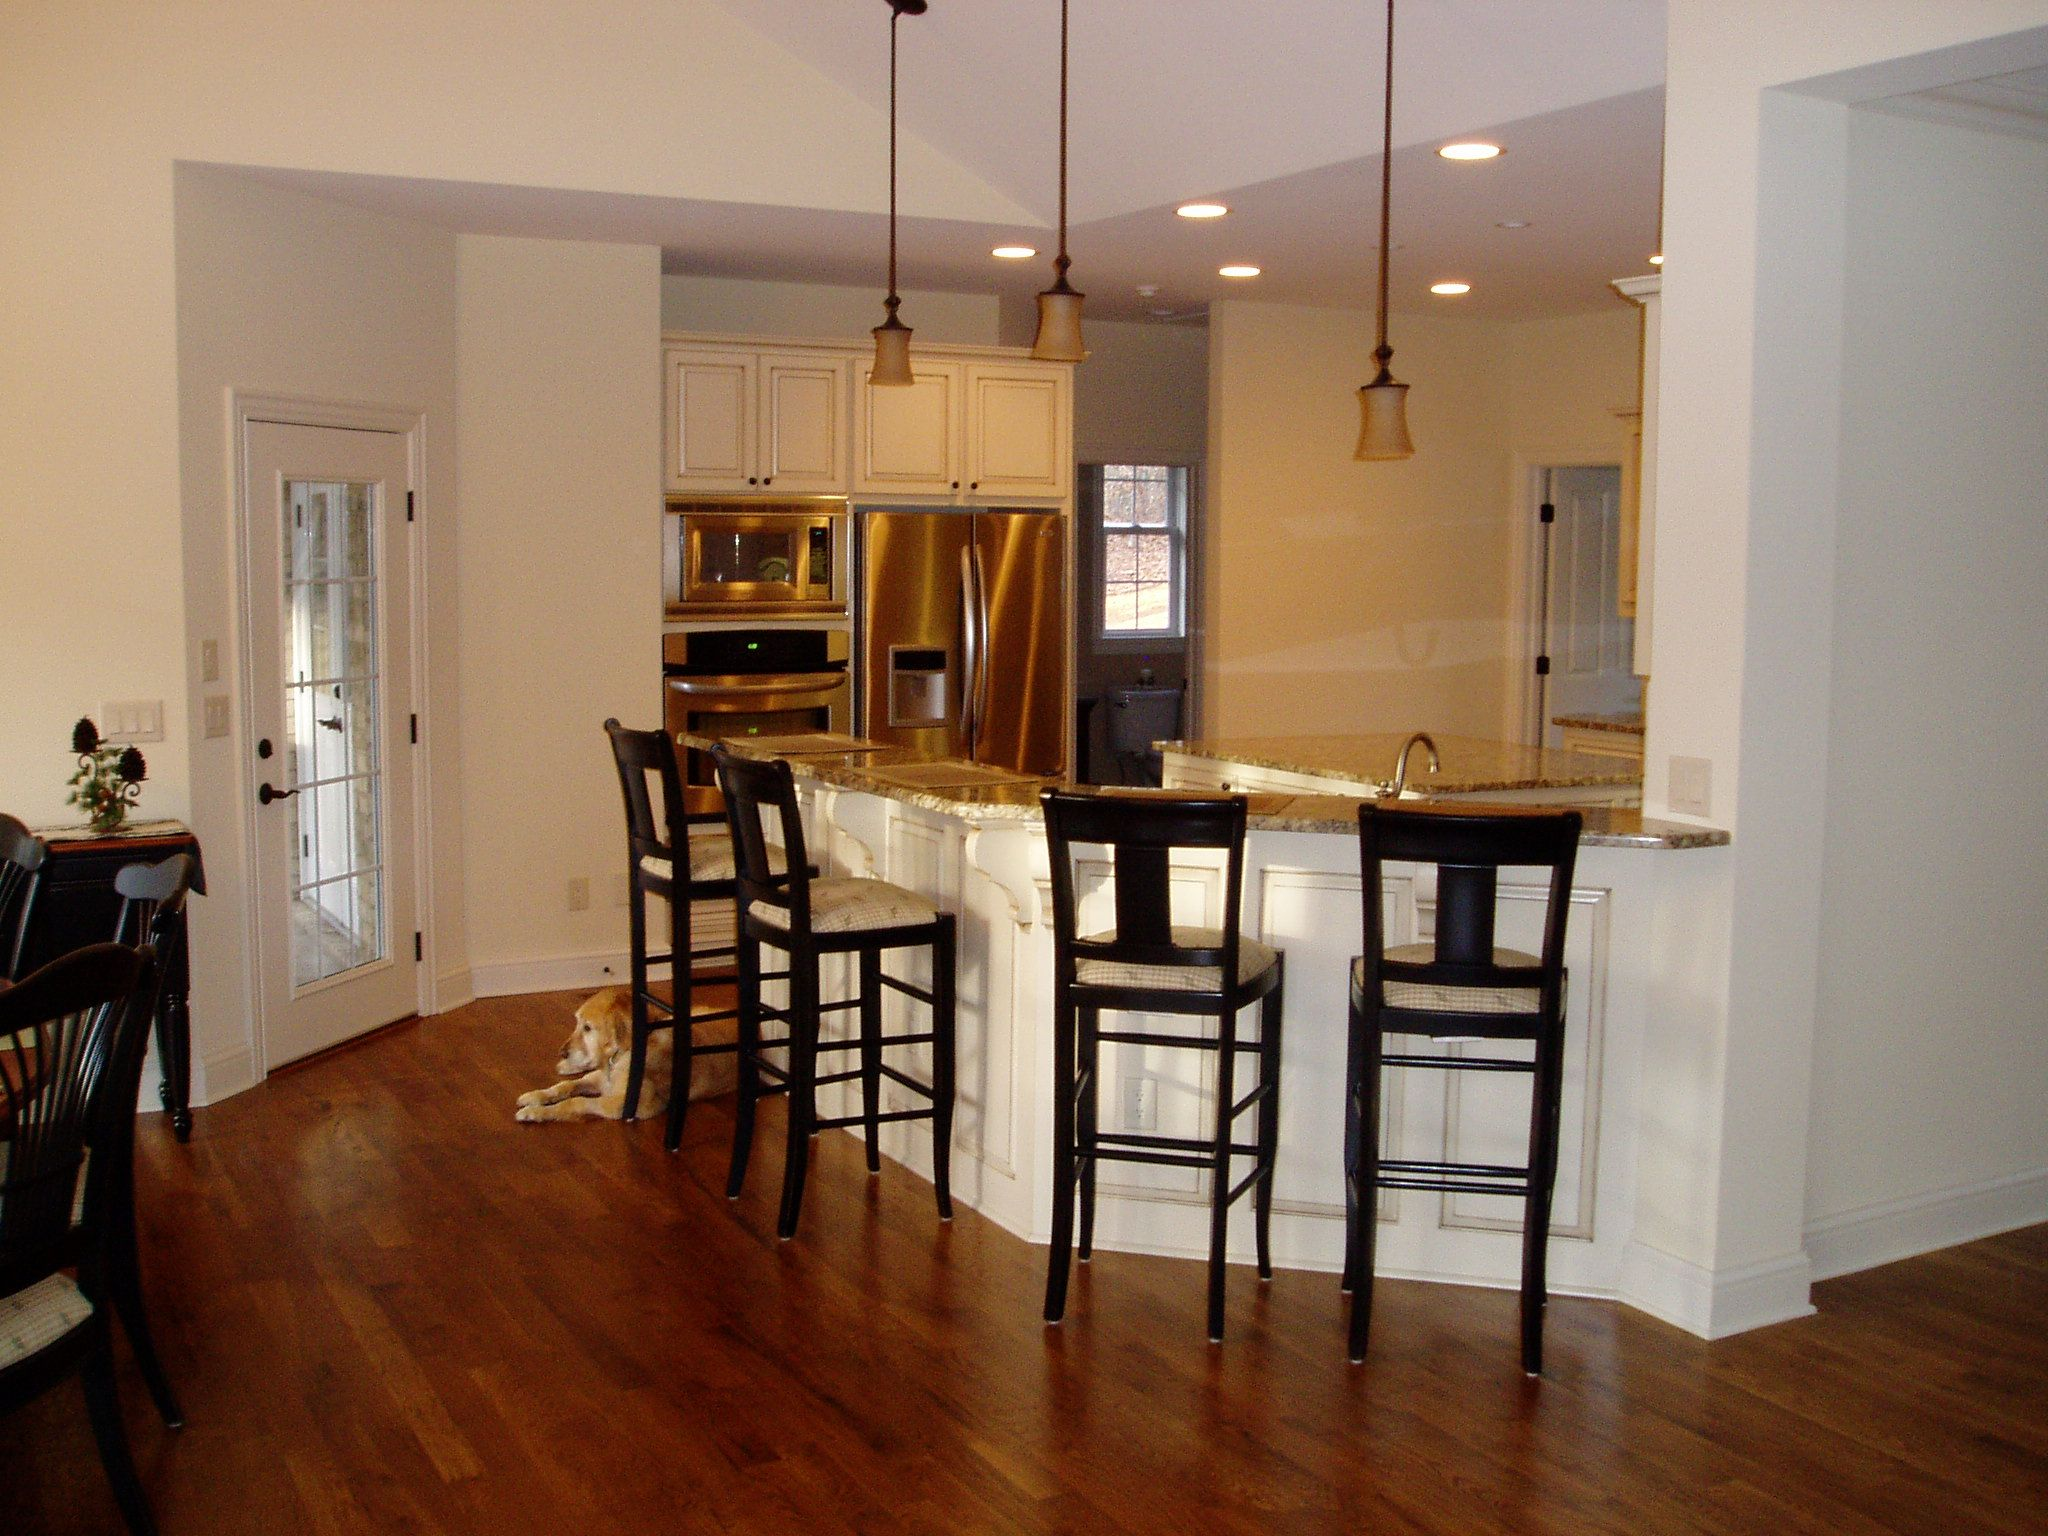 Kitchen Design Breakfast Bar Kitchen Breakfast Bar Wood Panels Adjoining Drywall Kitchens